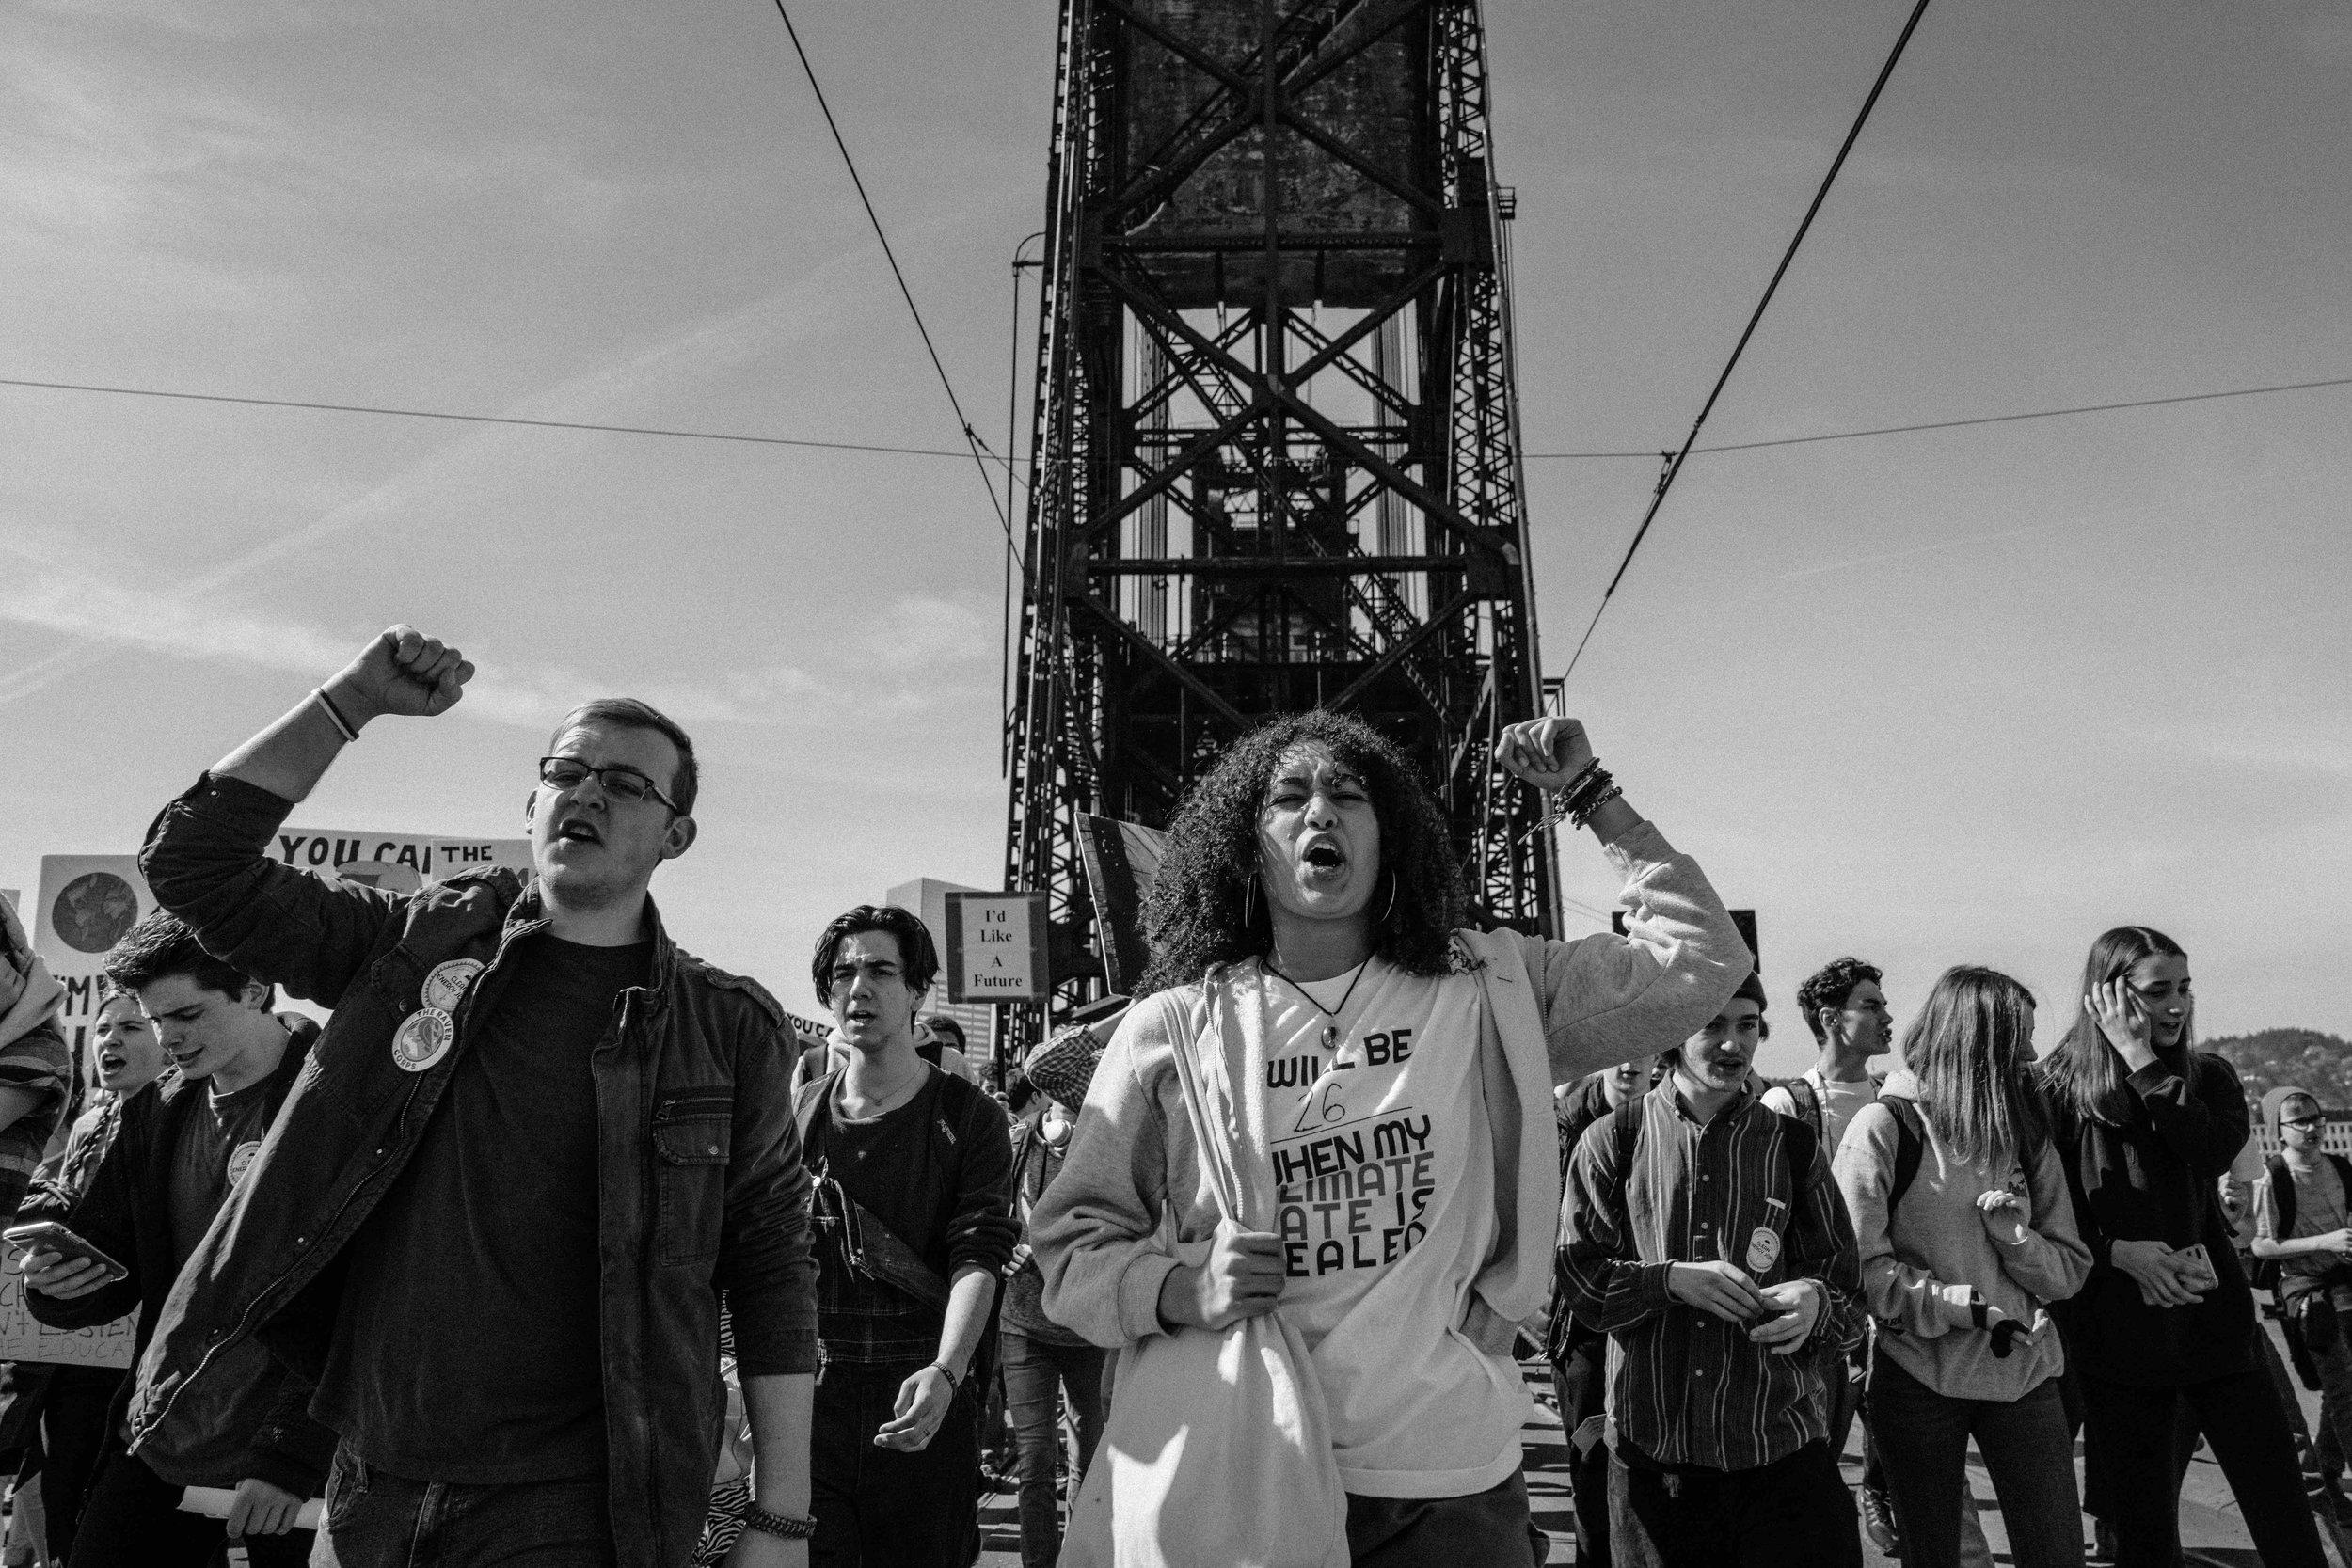 student-protest-climate-change-portland-josue-rivas.jpg